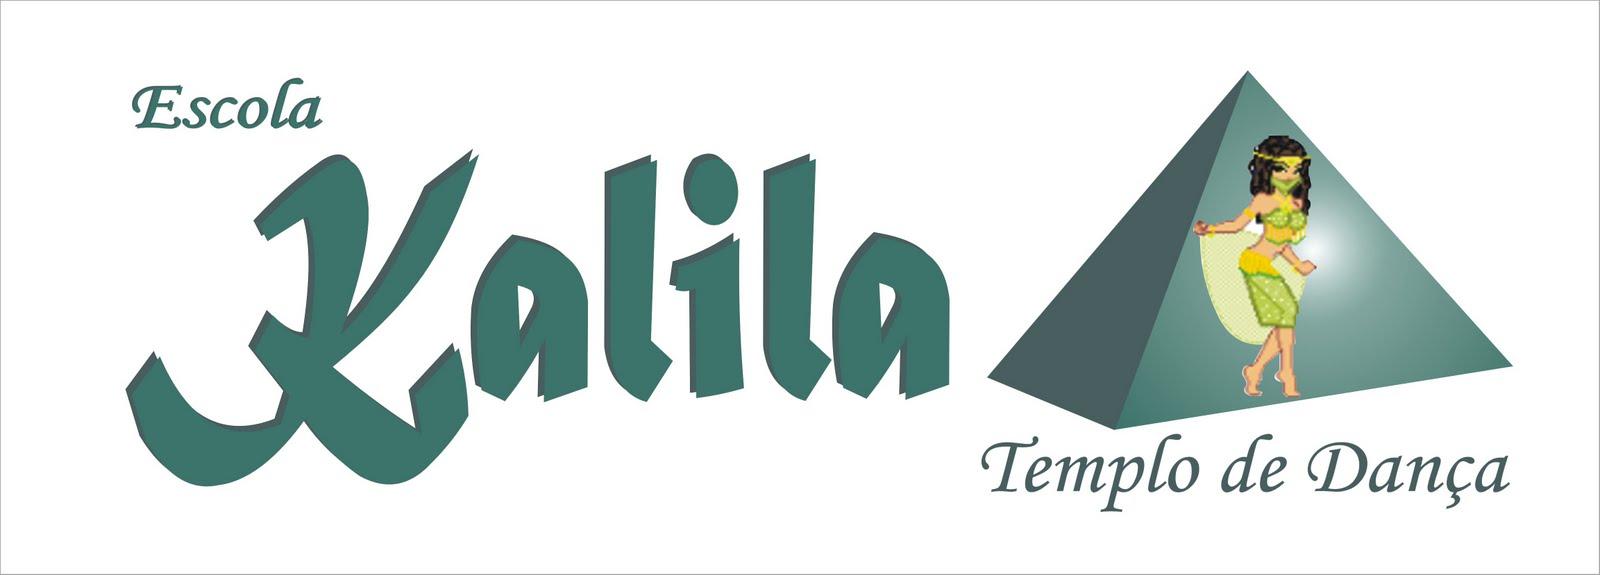 ESCOLA KALILA - TEMPLO DE DANÇA